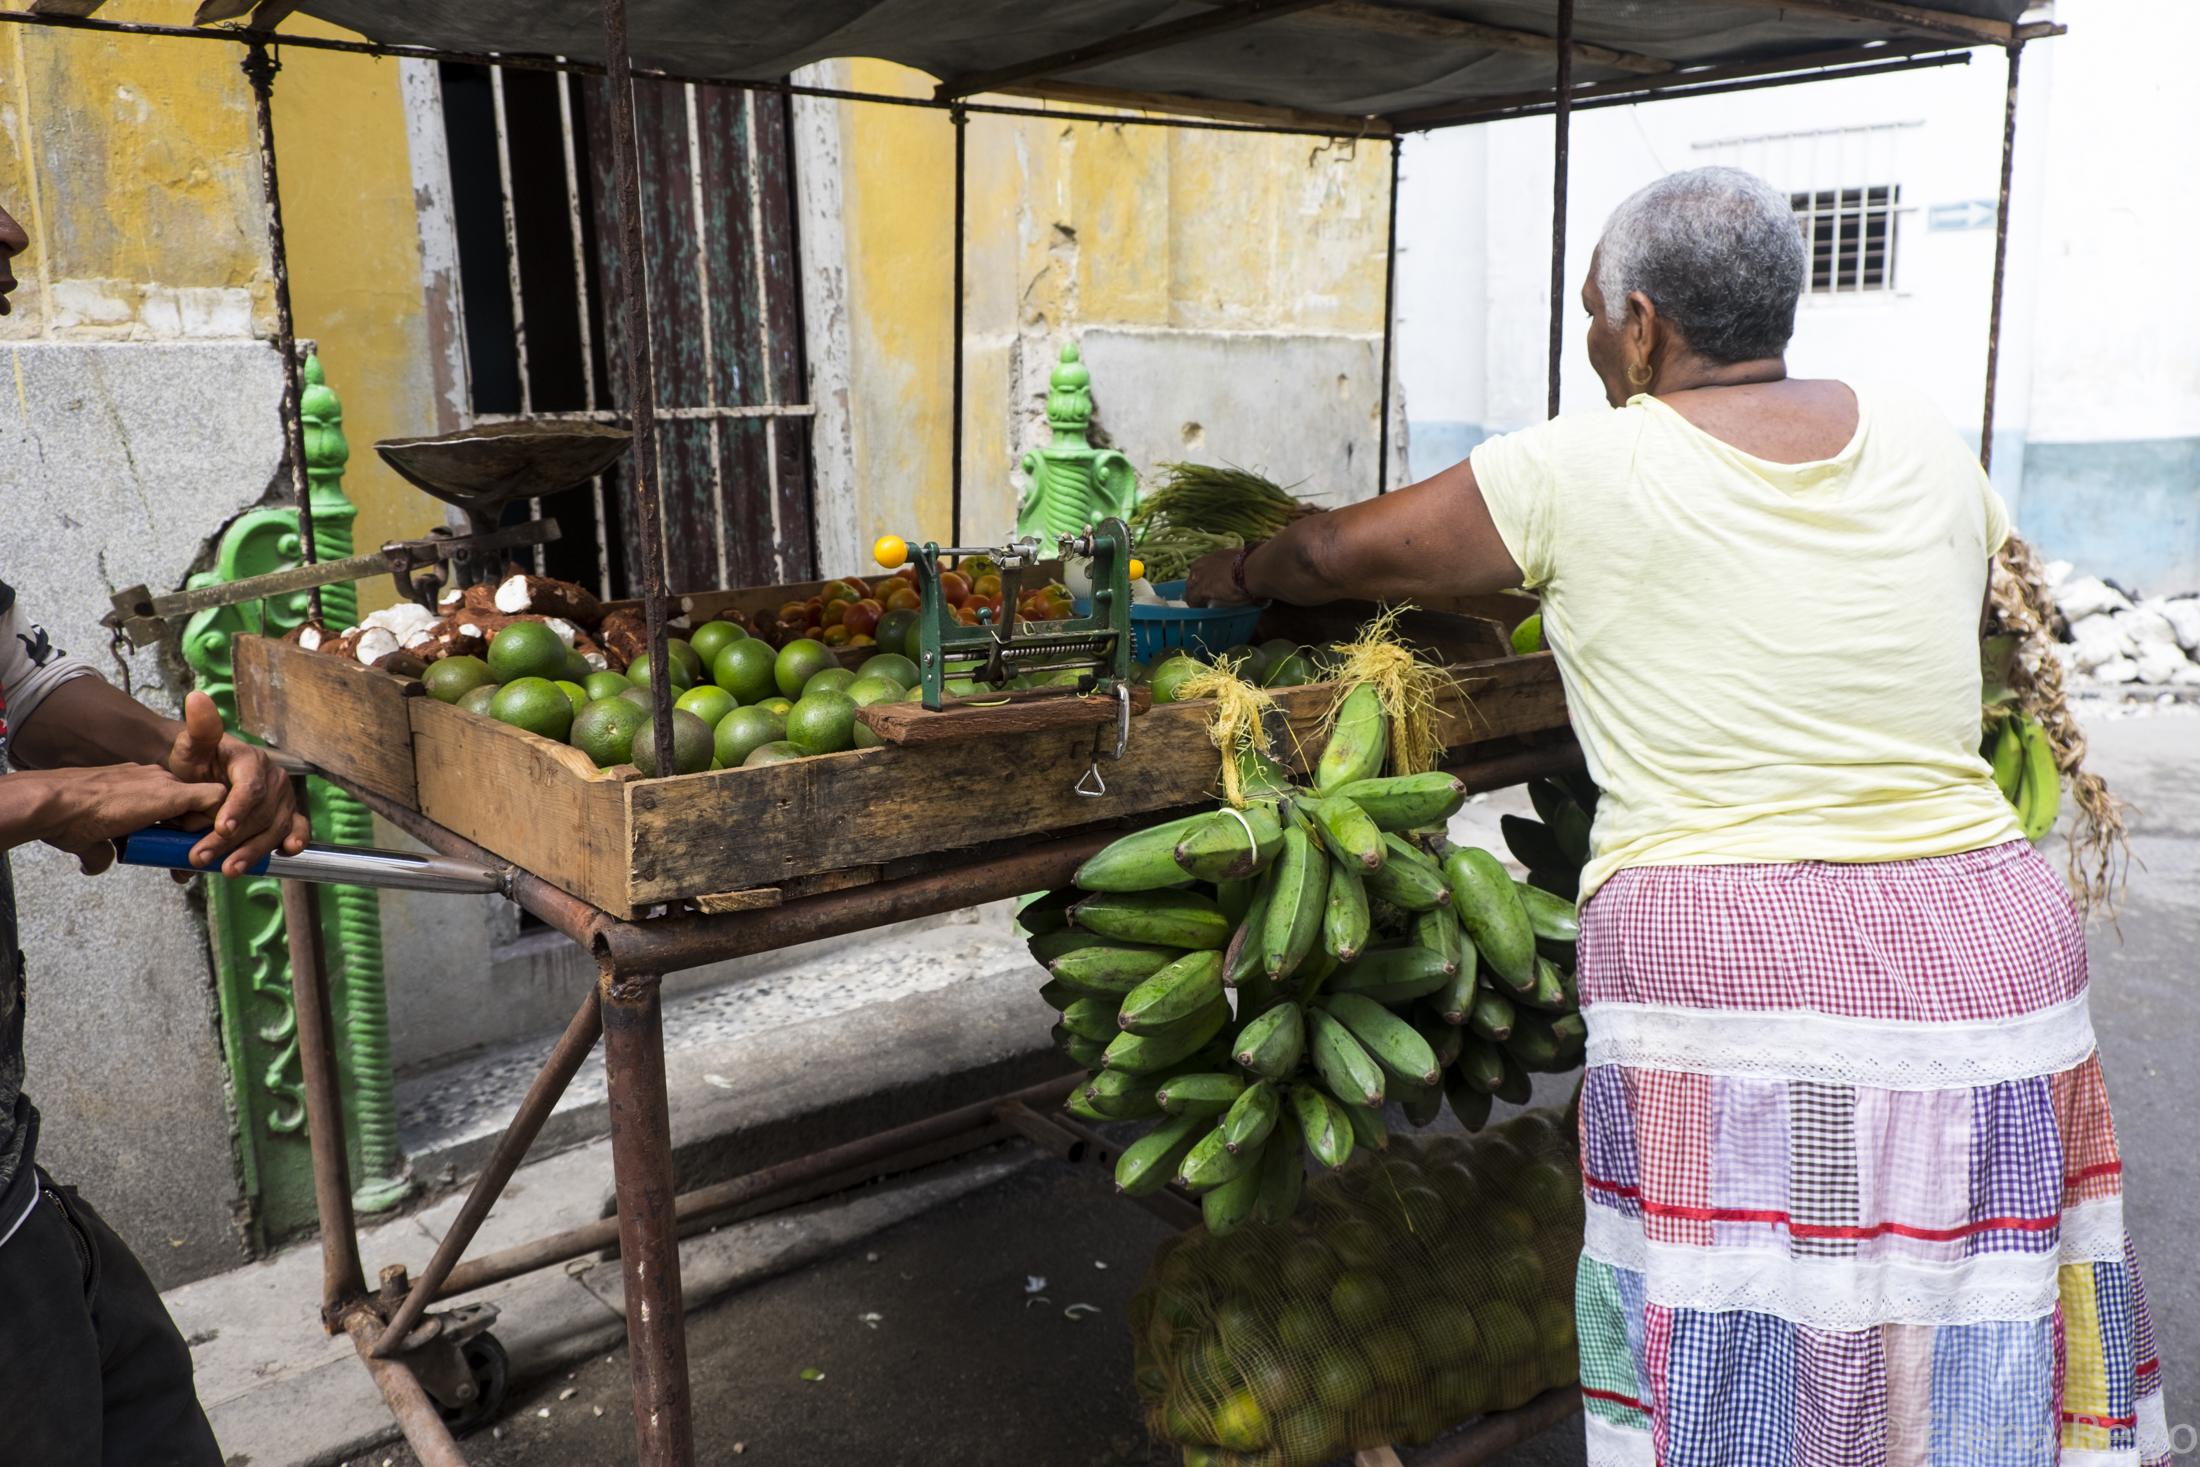 Market Views of Cuba at FoodPractice.com